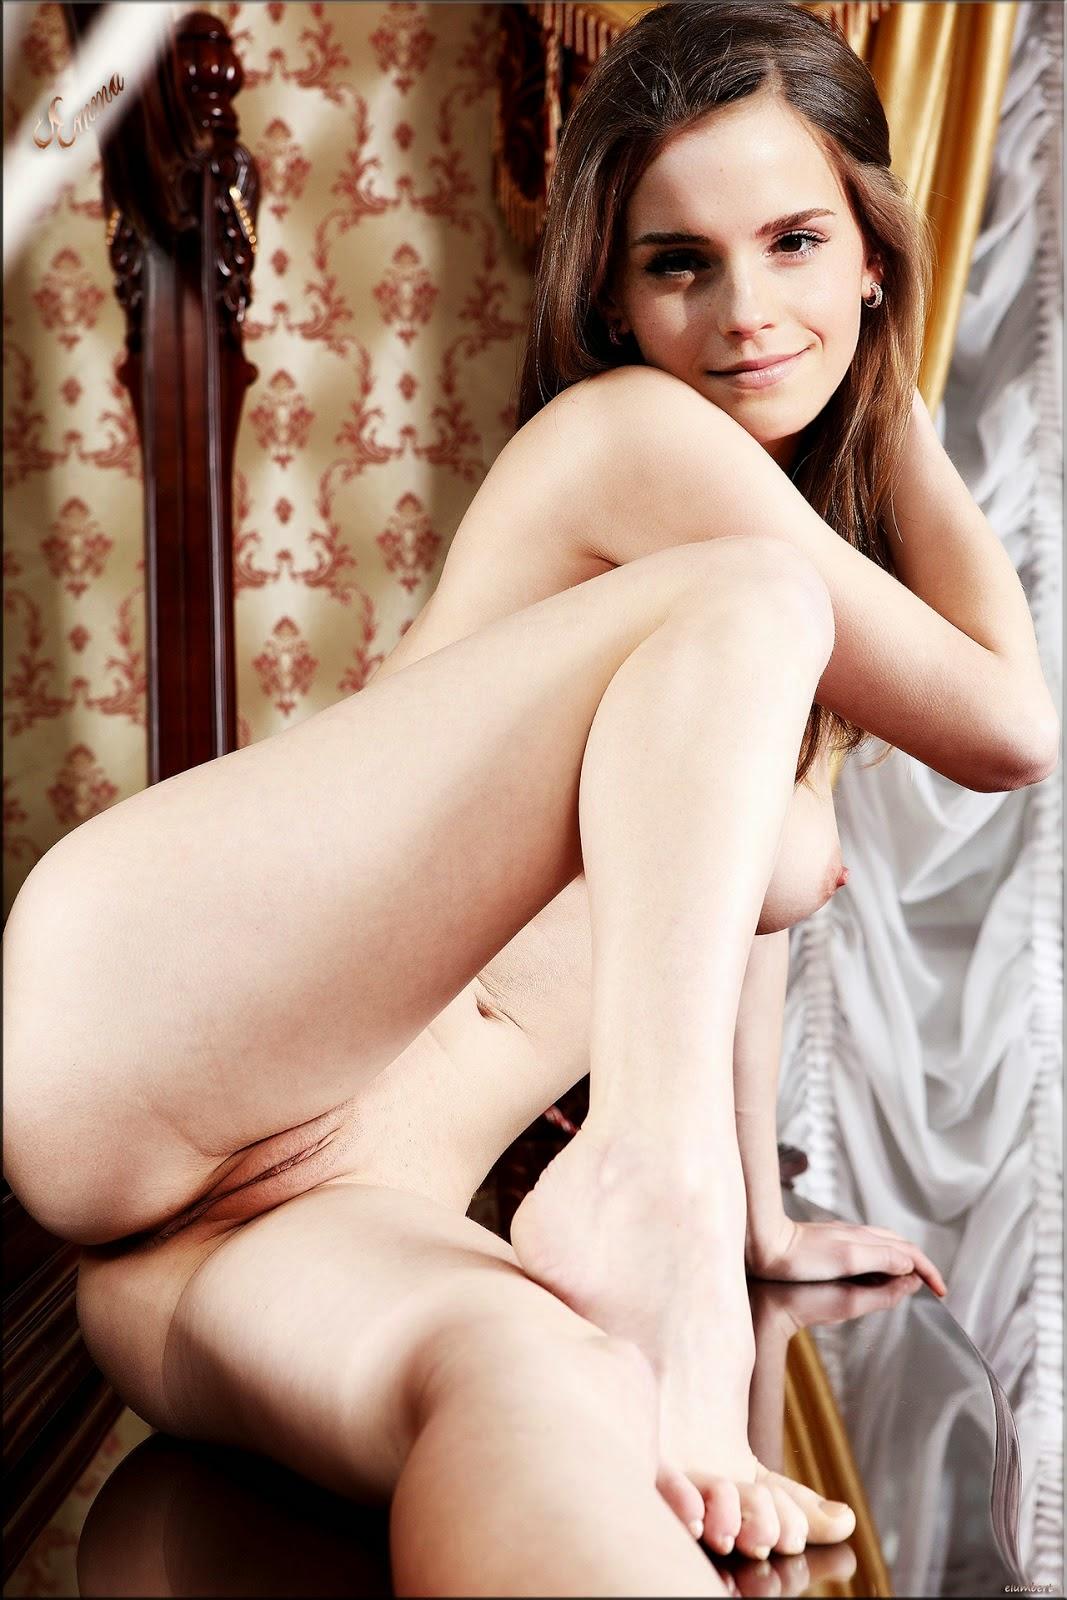 emma watson naked having sex drunk